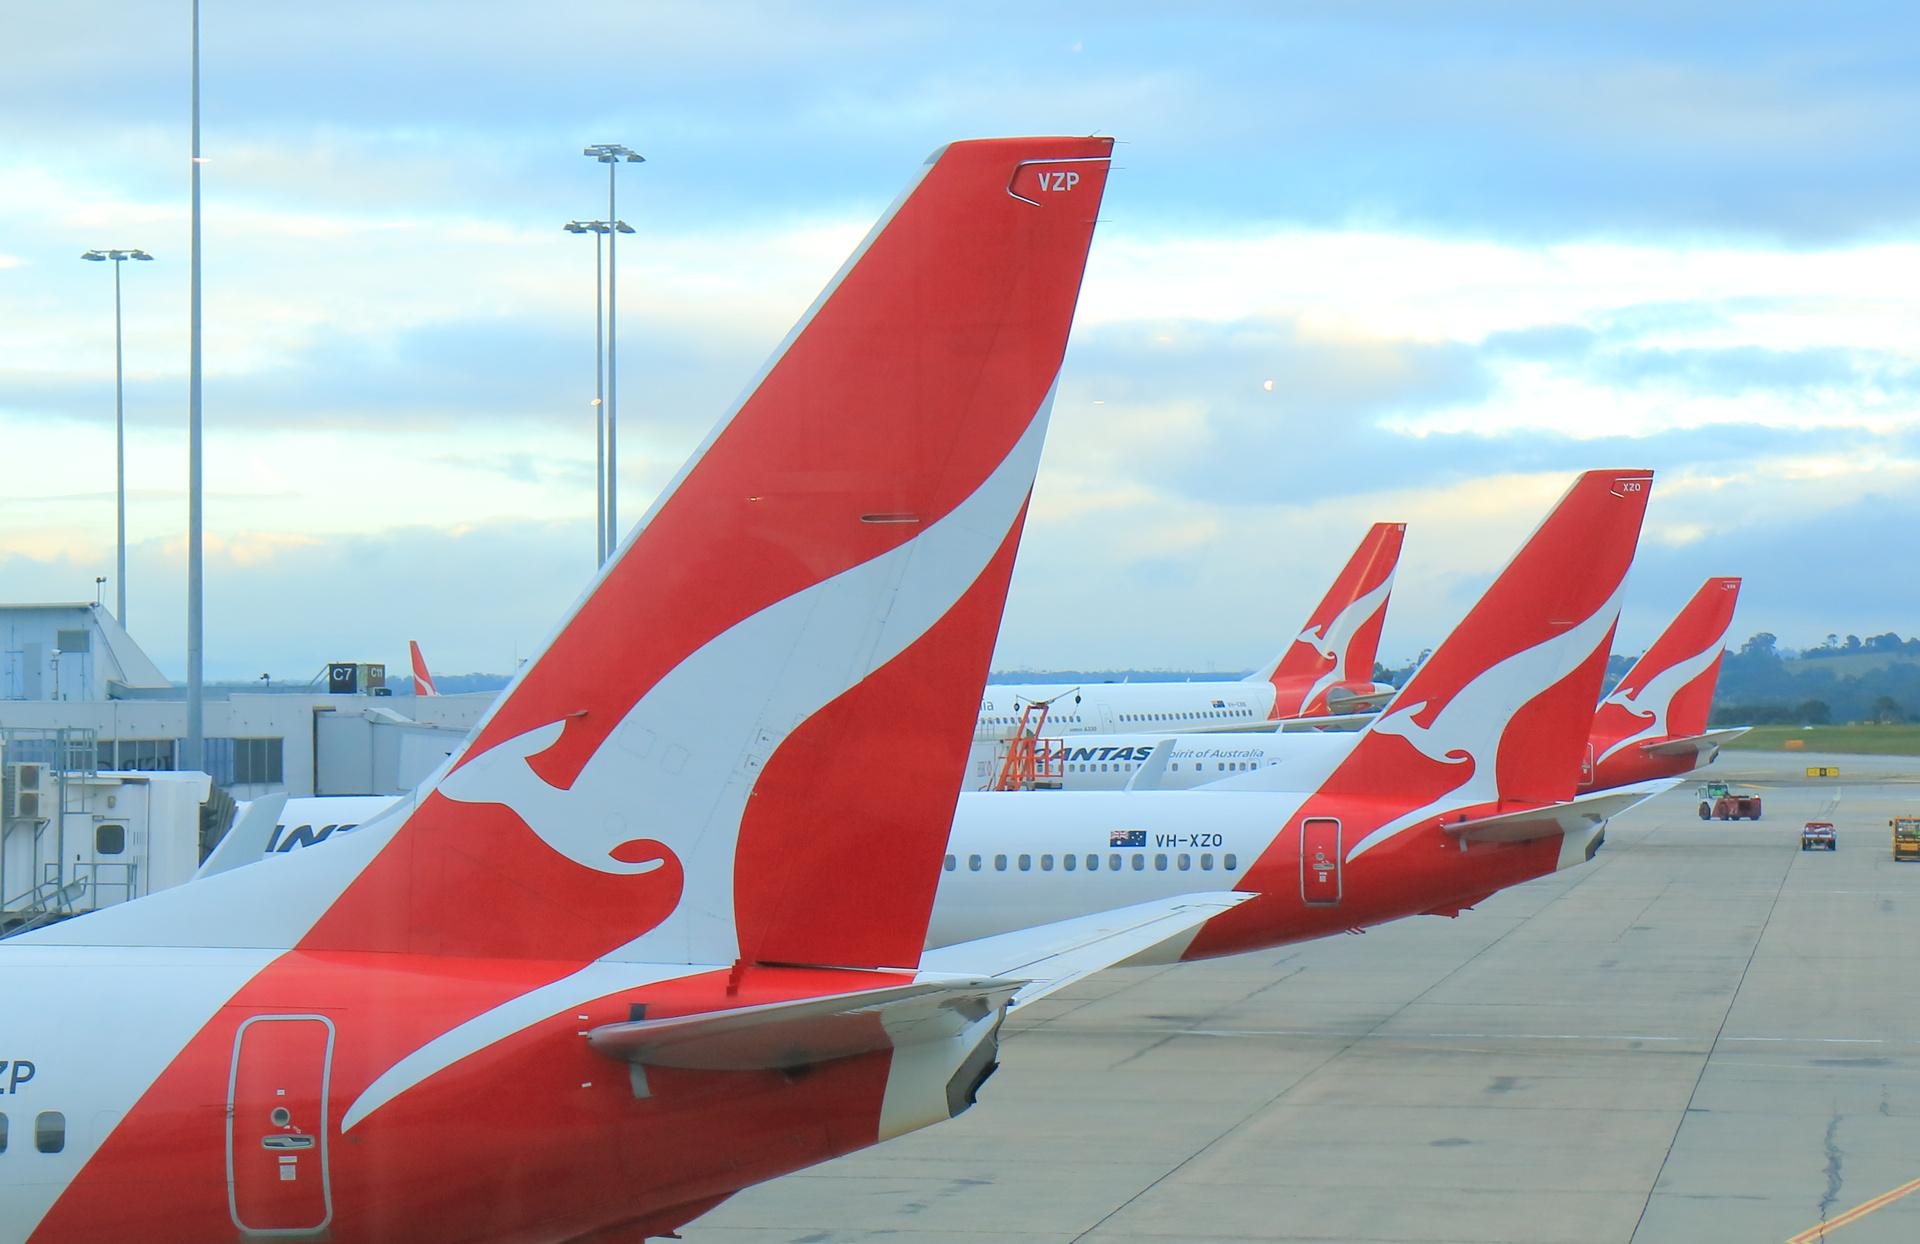 Qantas places temporary ban on snub-nose dog flights